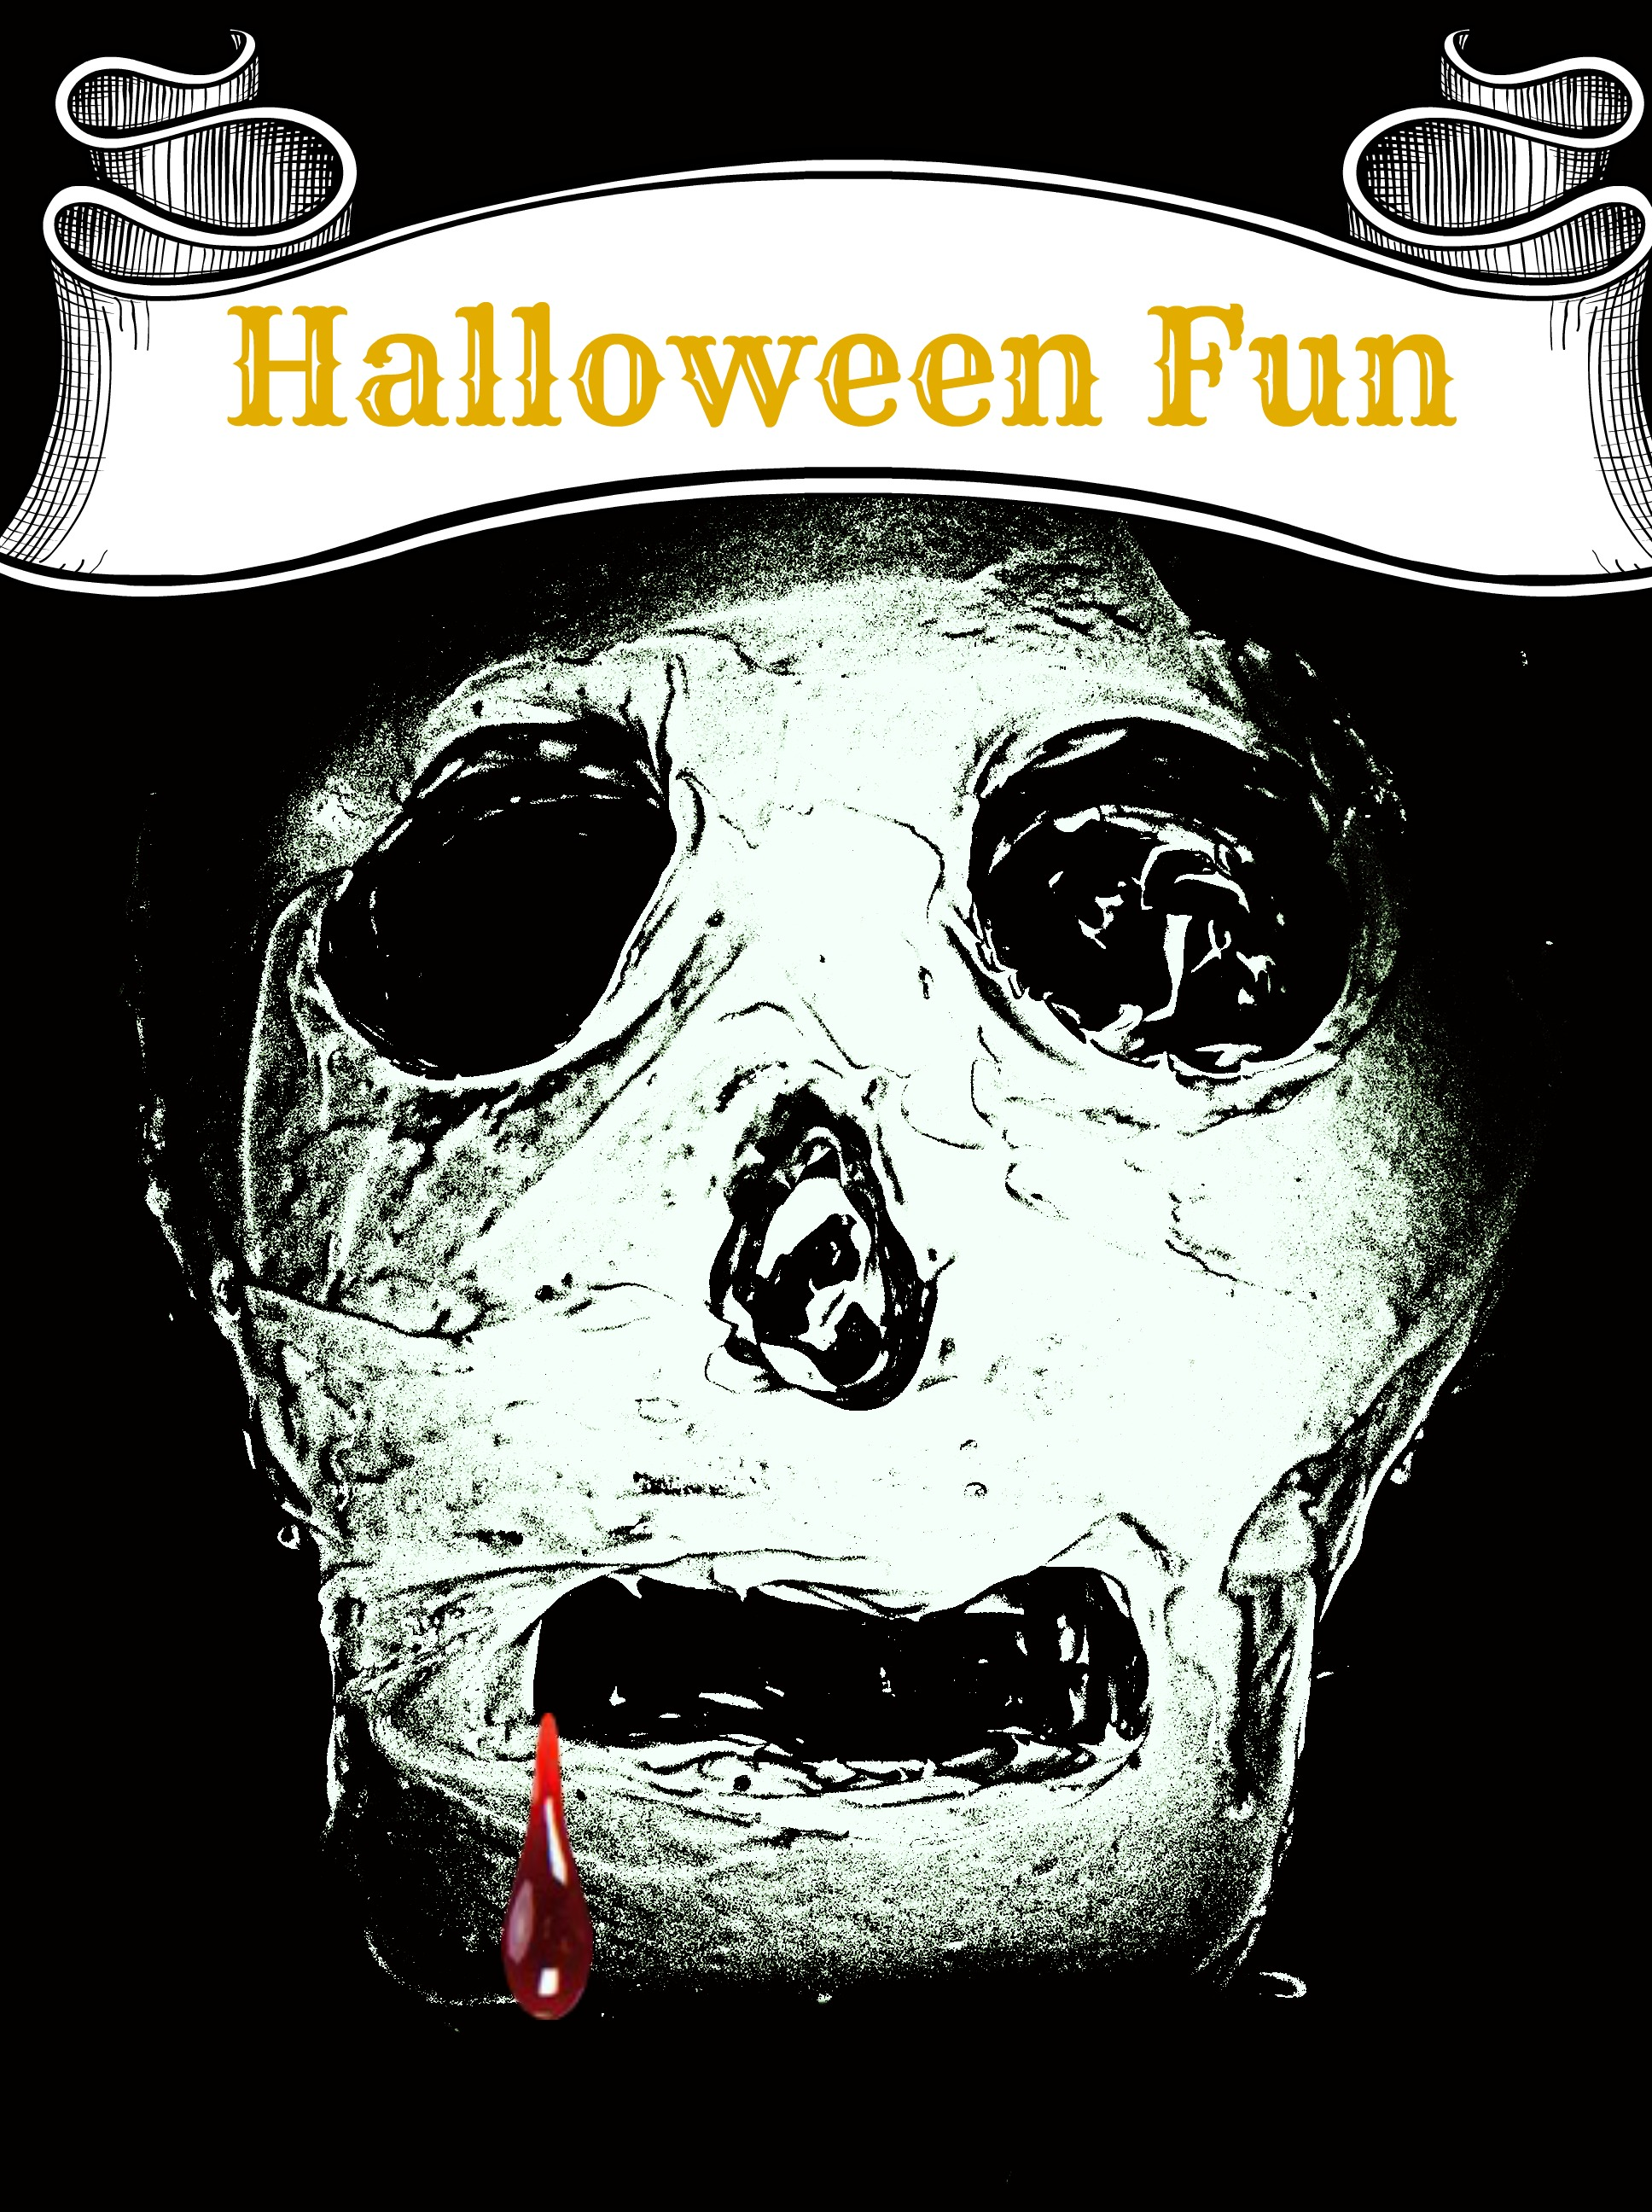 Stacy Sews And Schools Halloween Fun